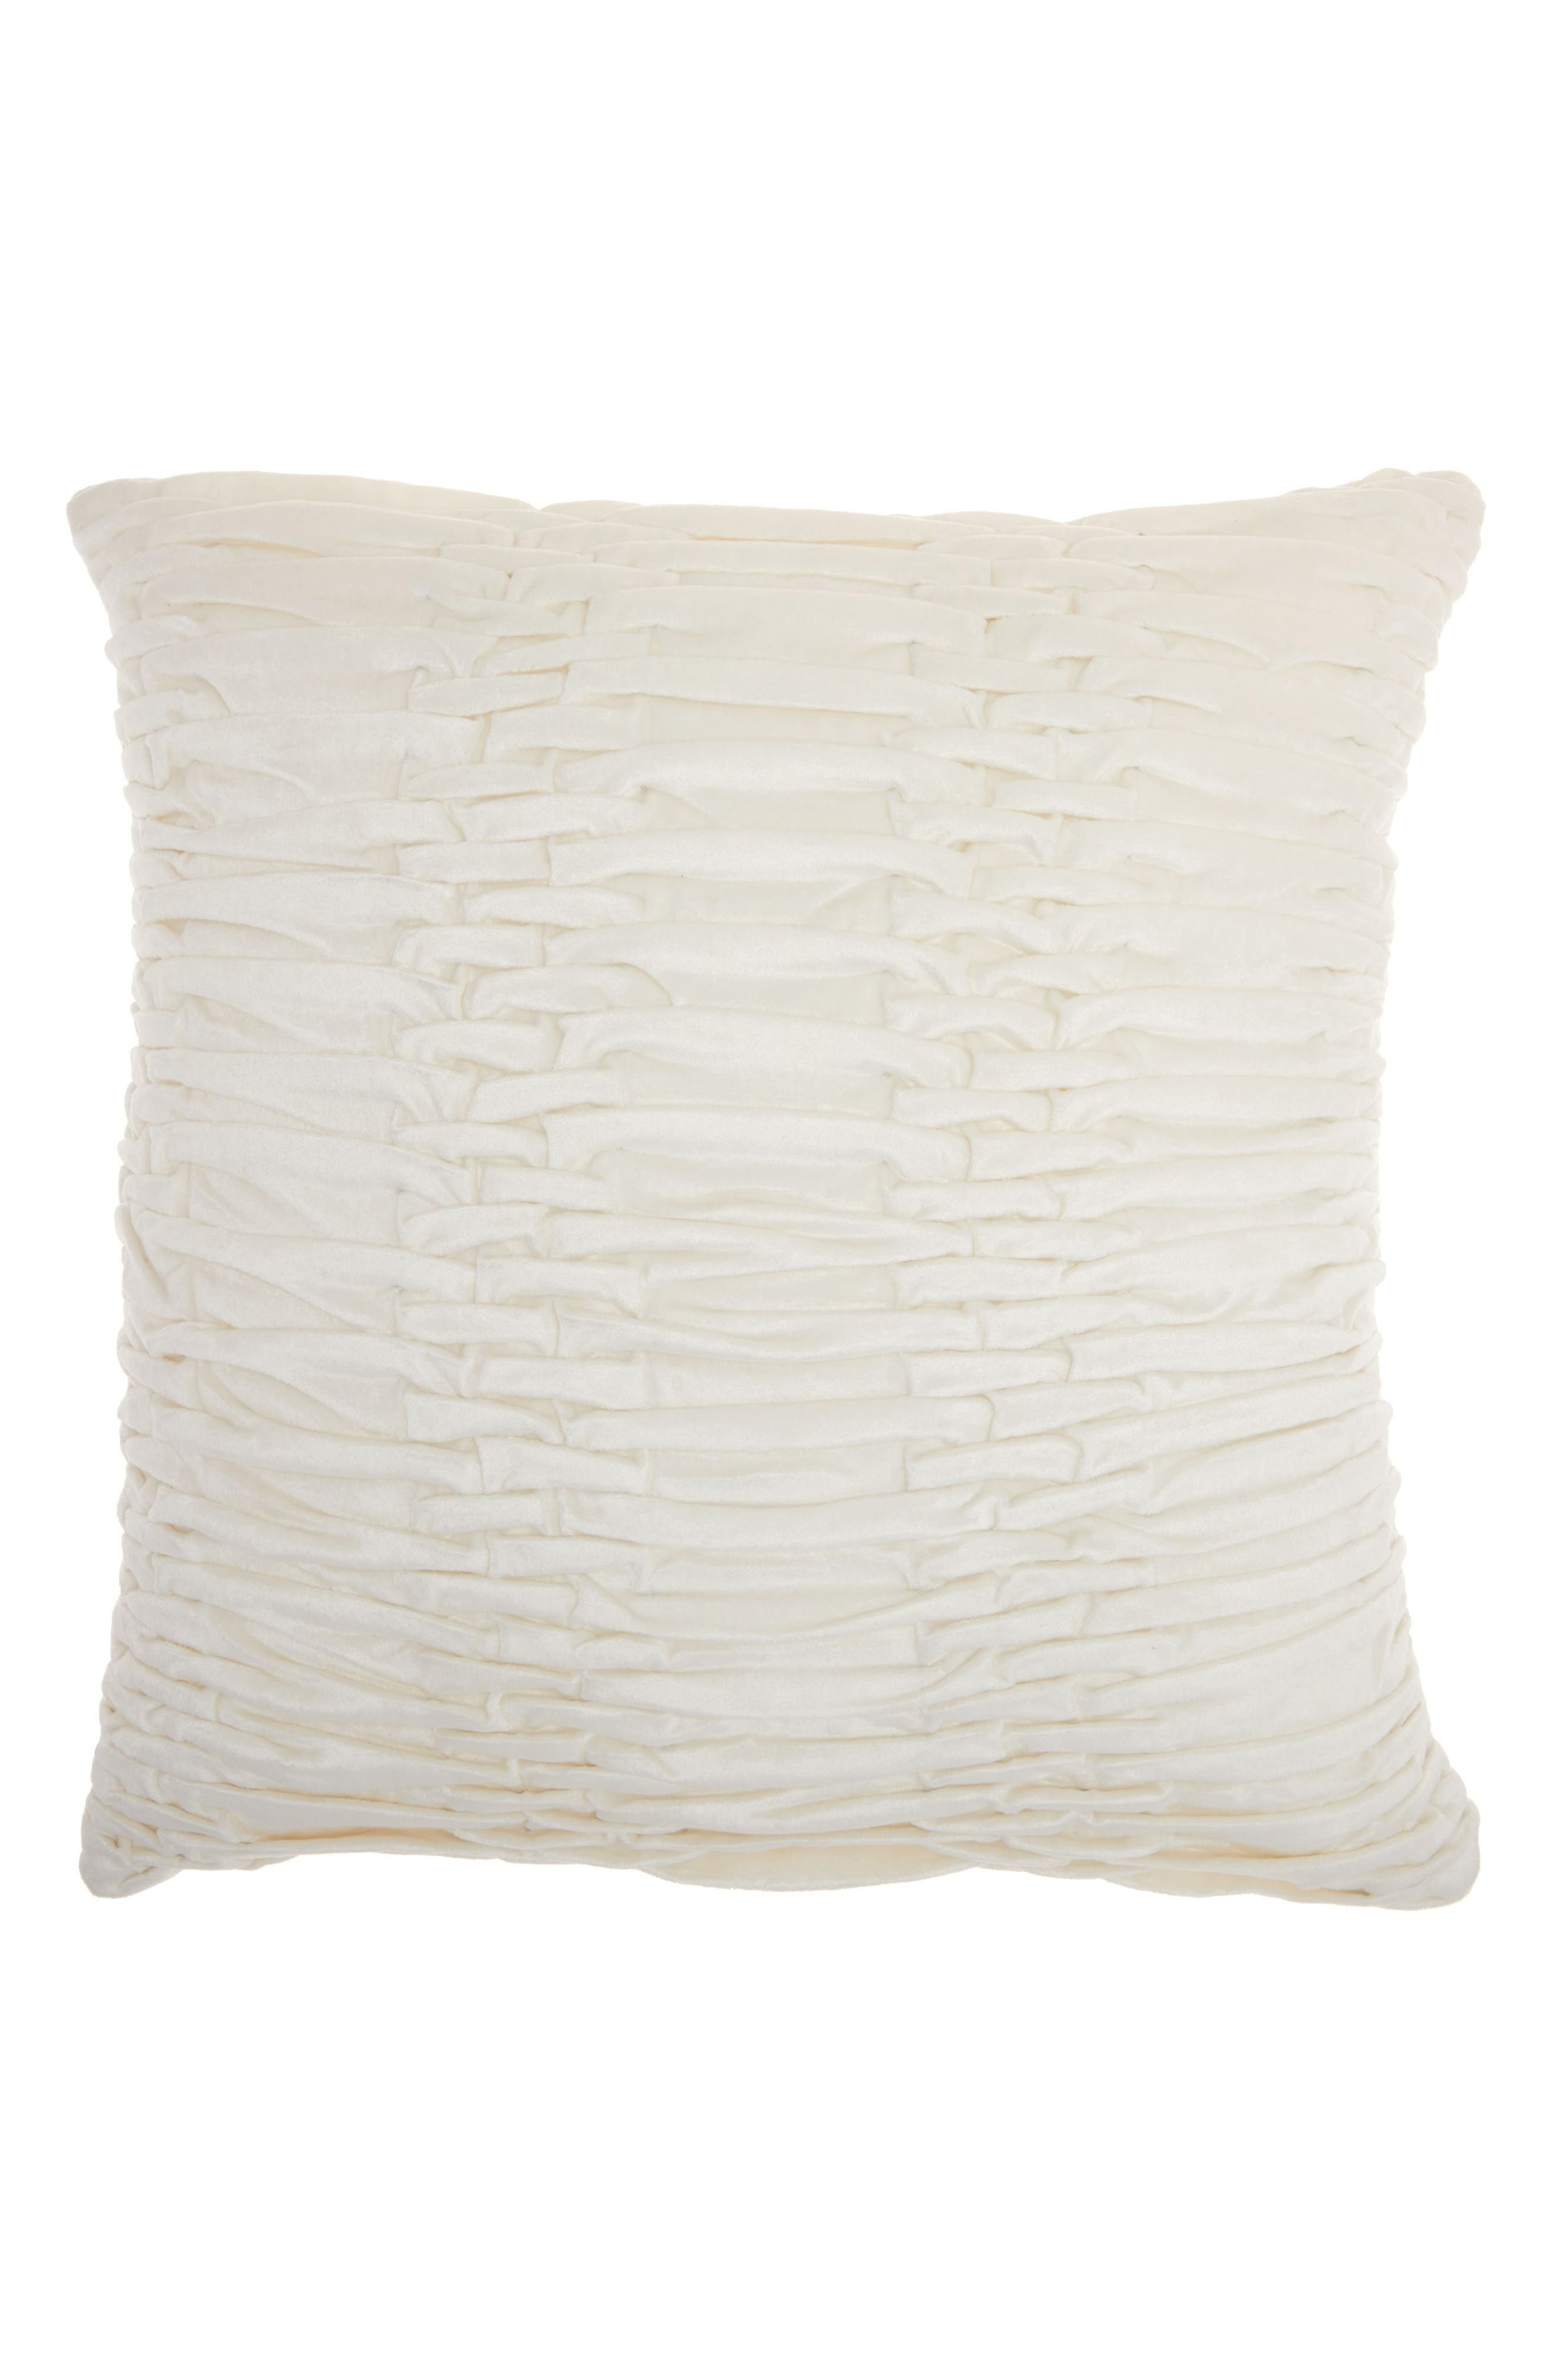 Pleated Velvet Accent Pillow,                         Main,                         color, Cream